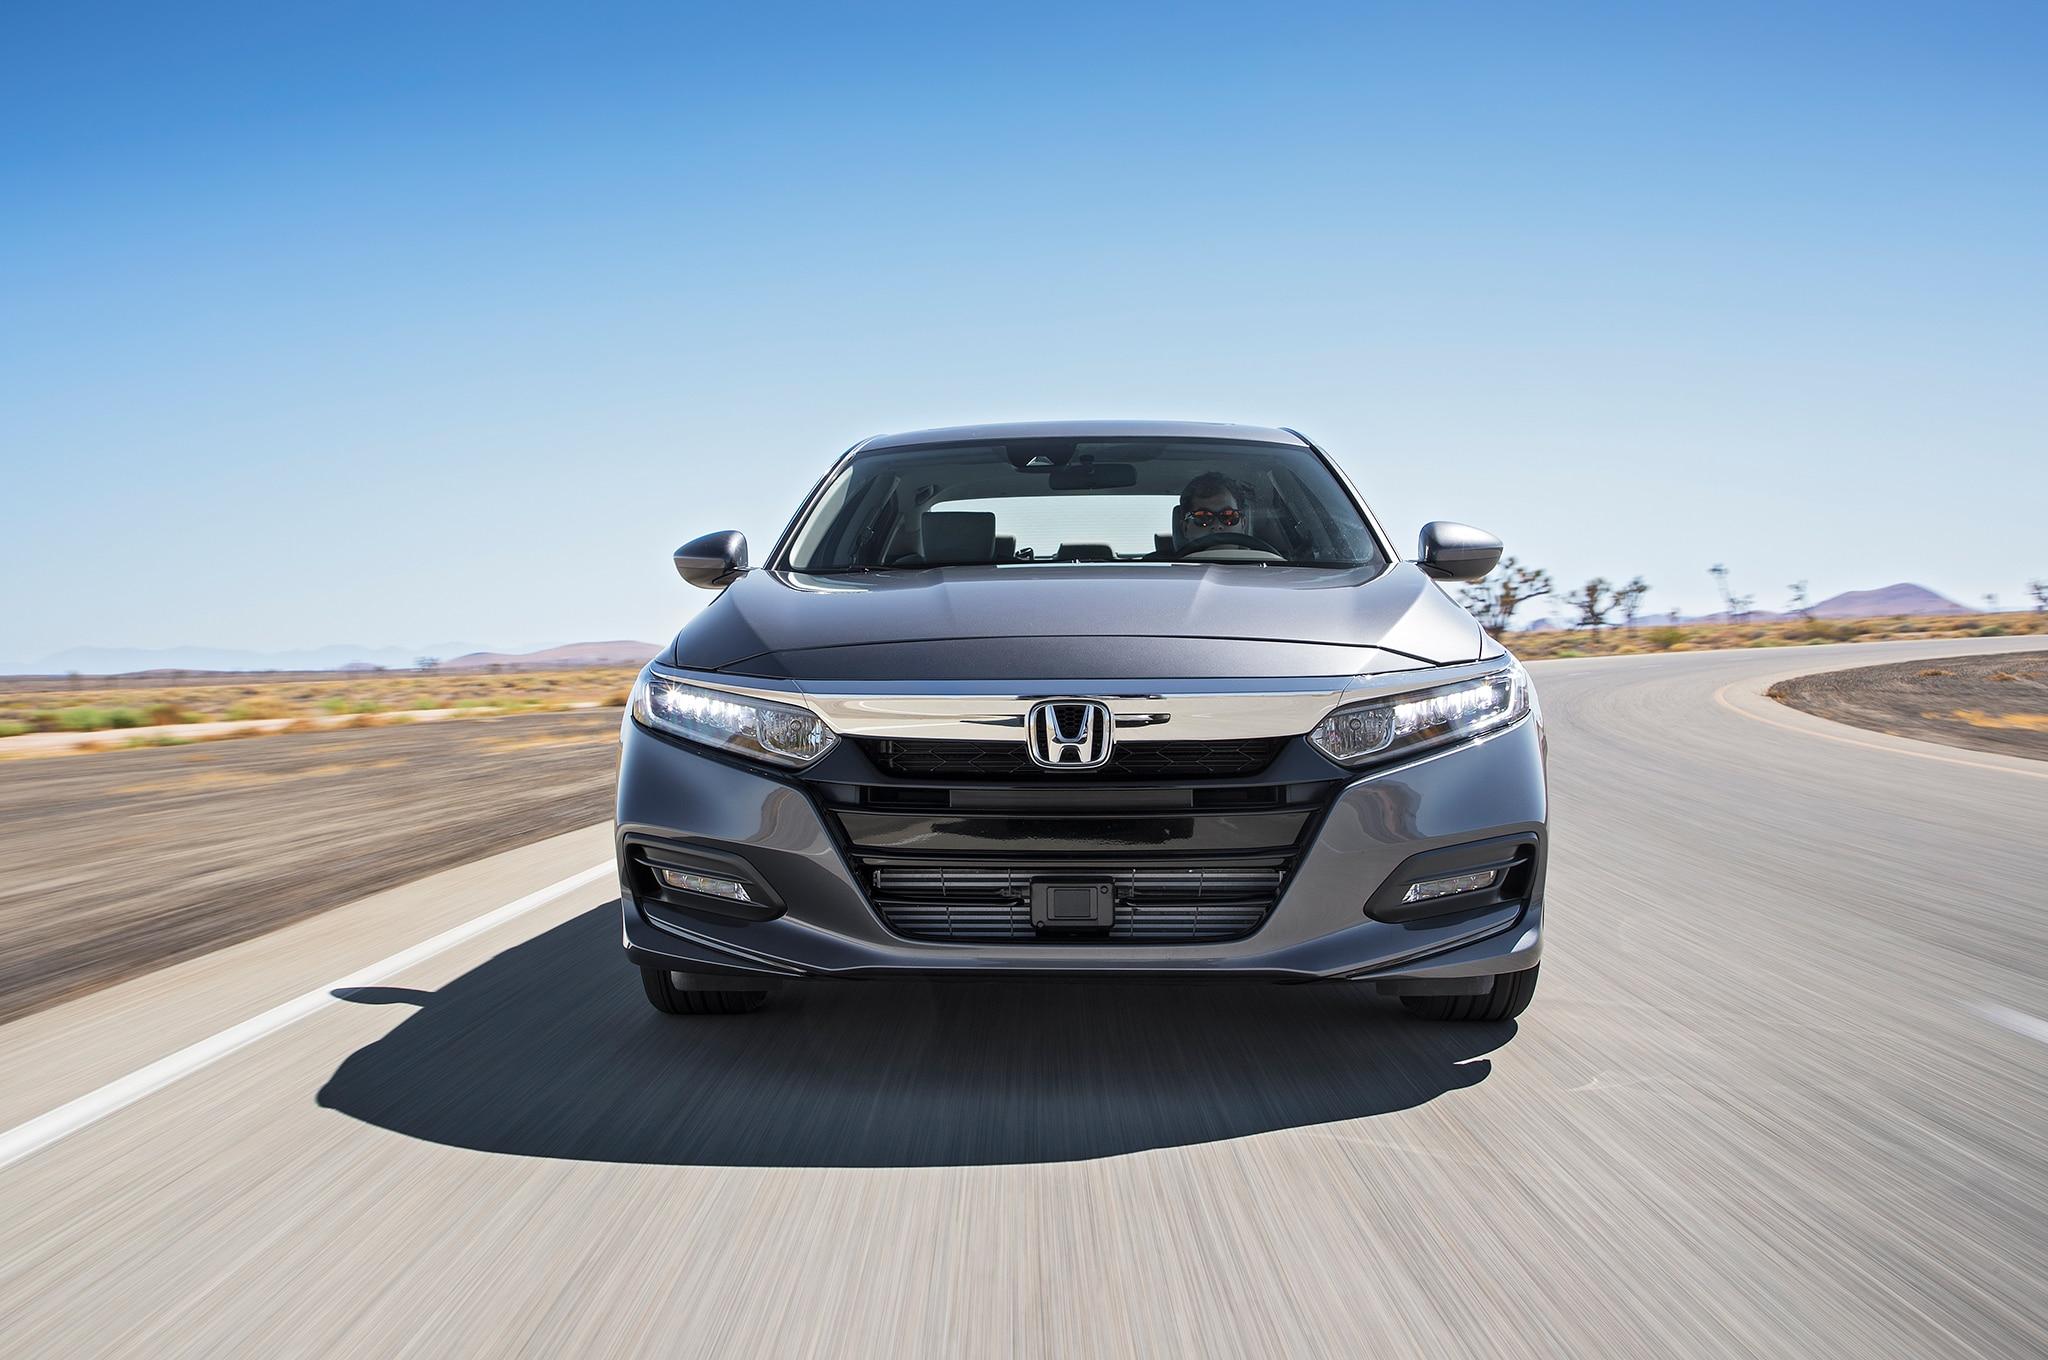 2018 Honda Civic Type R Specs >> 2018 Honda Accord 2.0T Gets a Civic Type R-Like Power ...